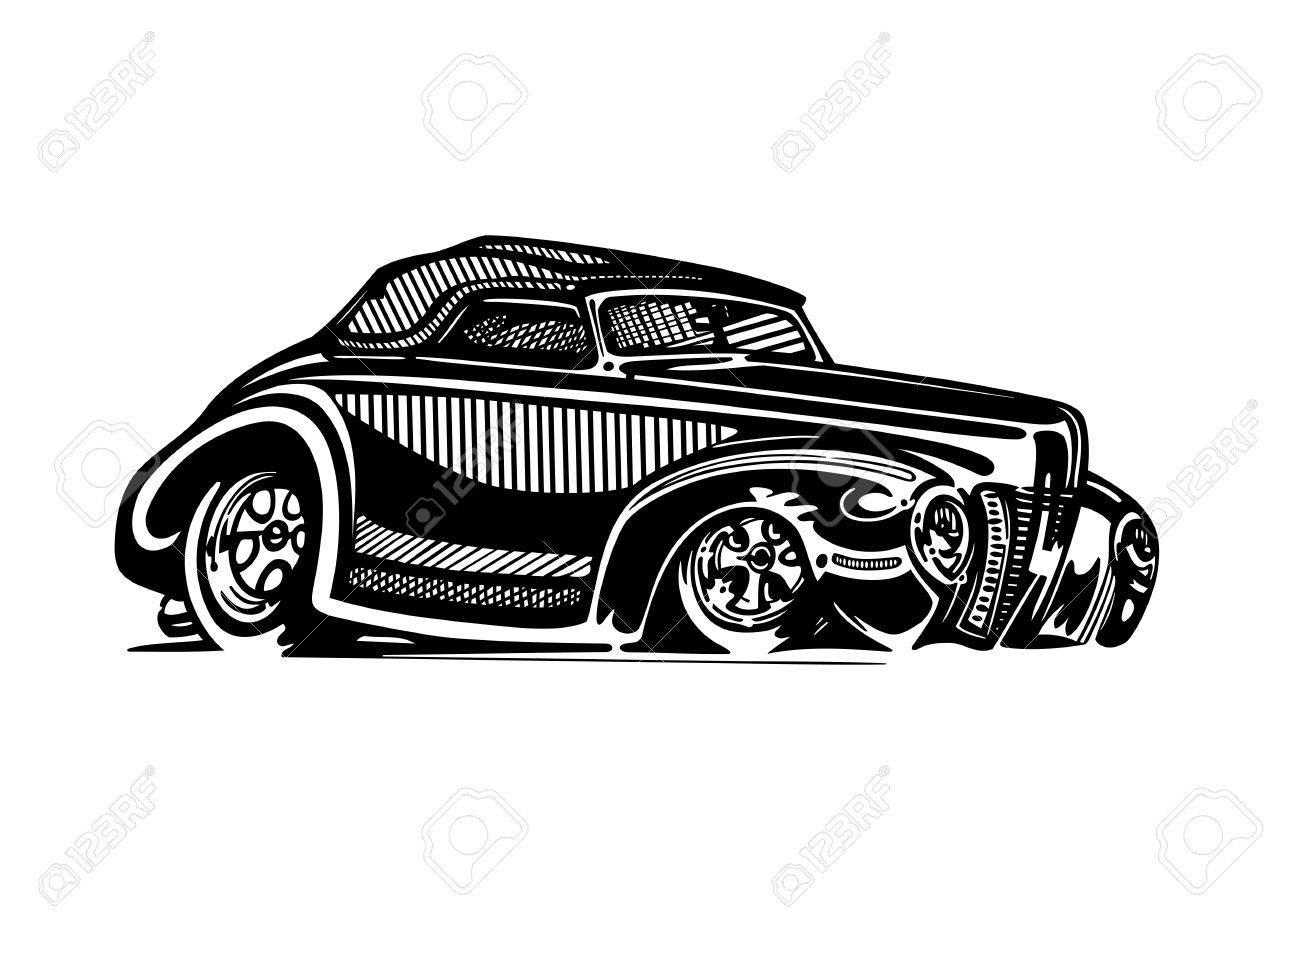 Vector retro hotrod car clipart cartoon Illustration..